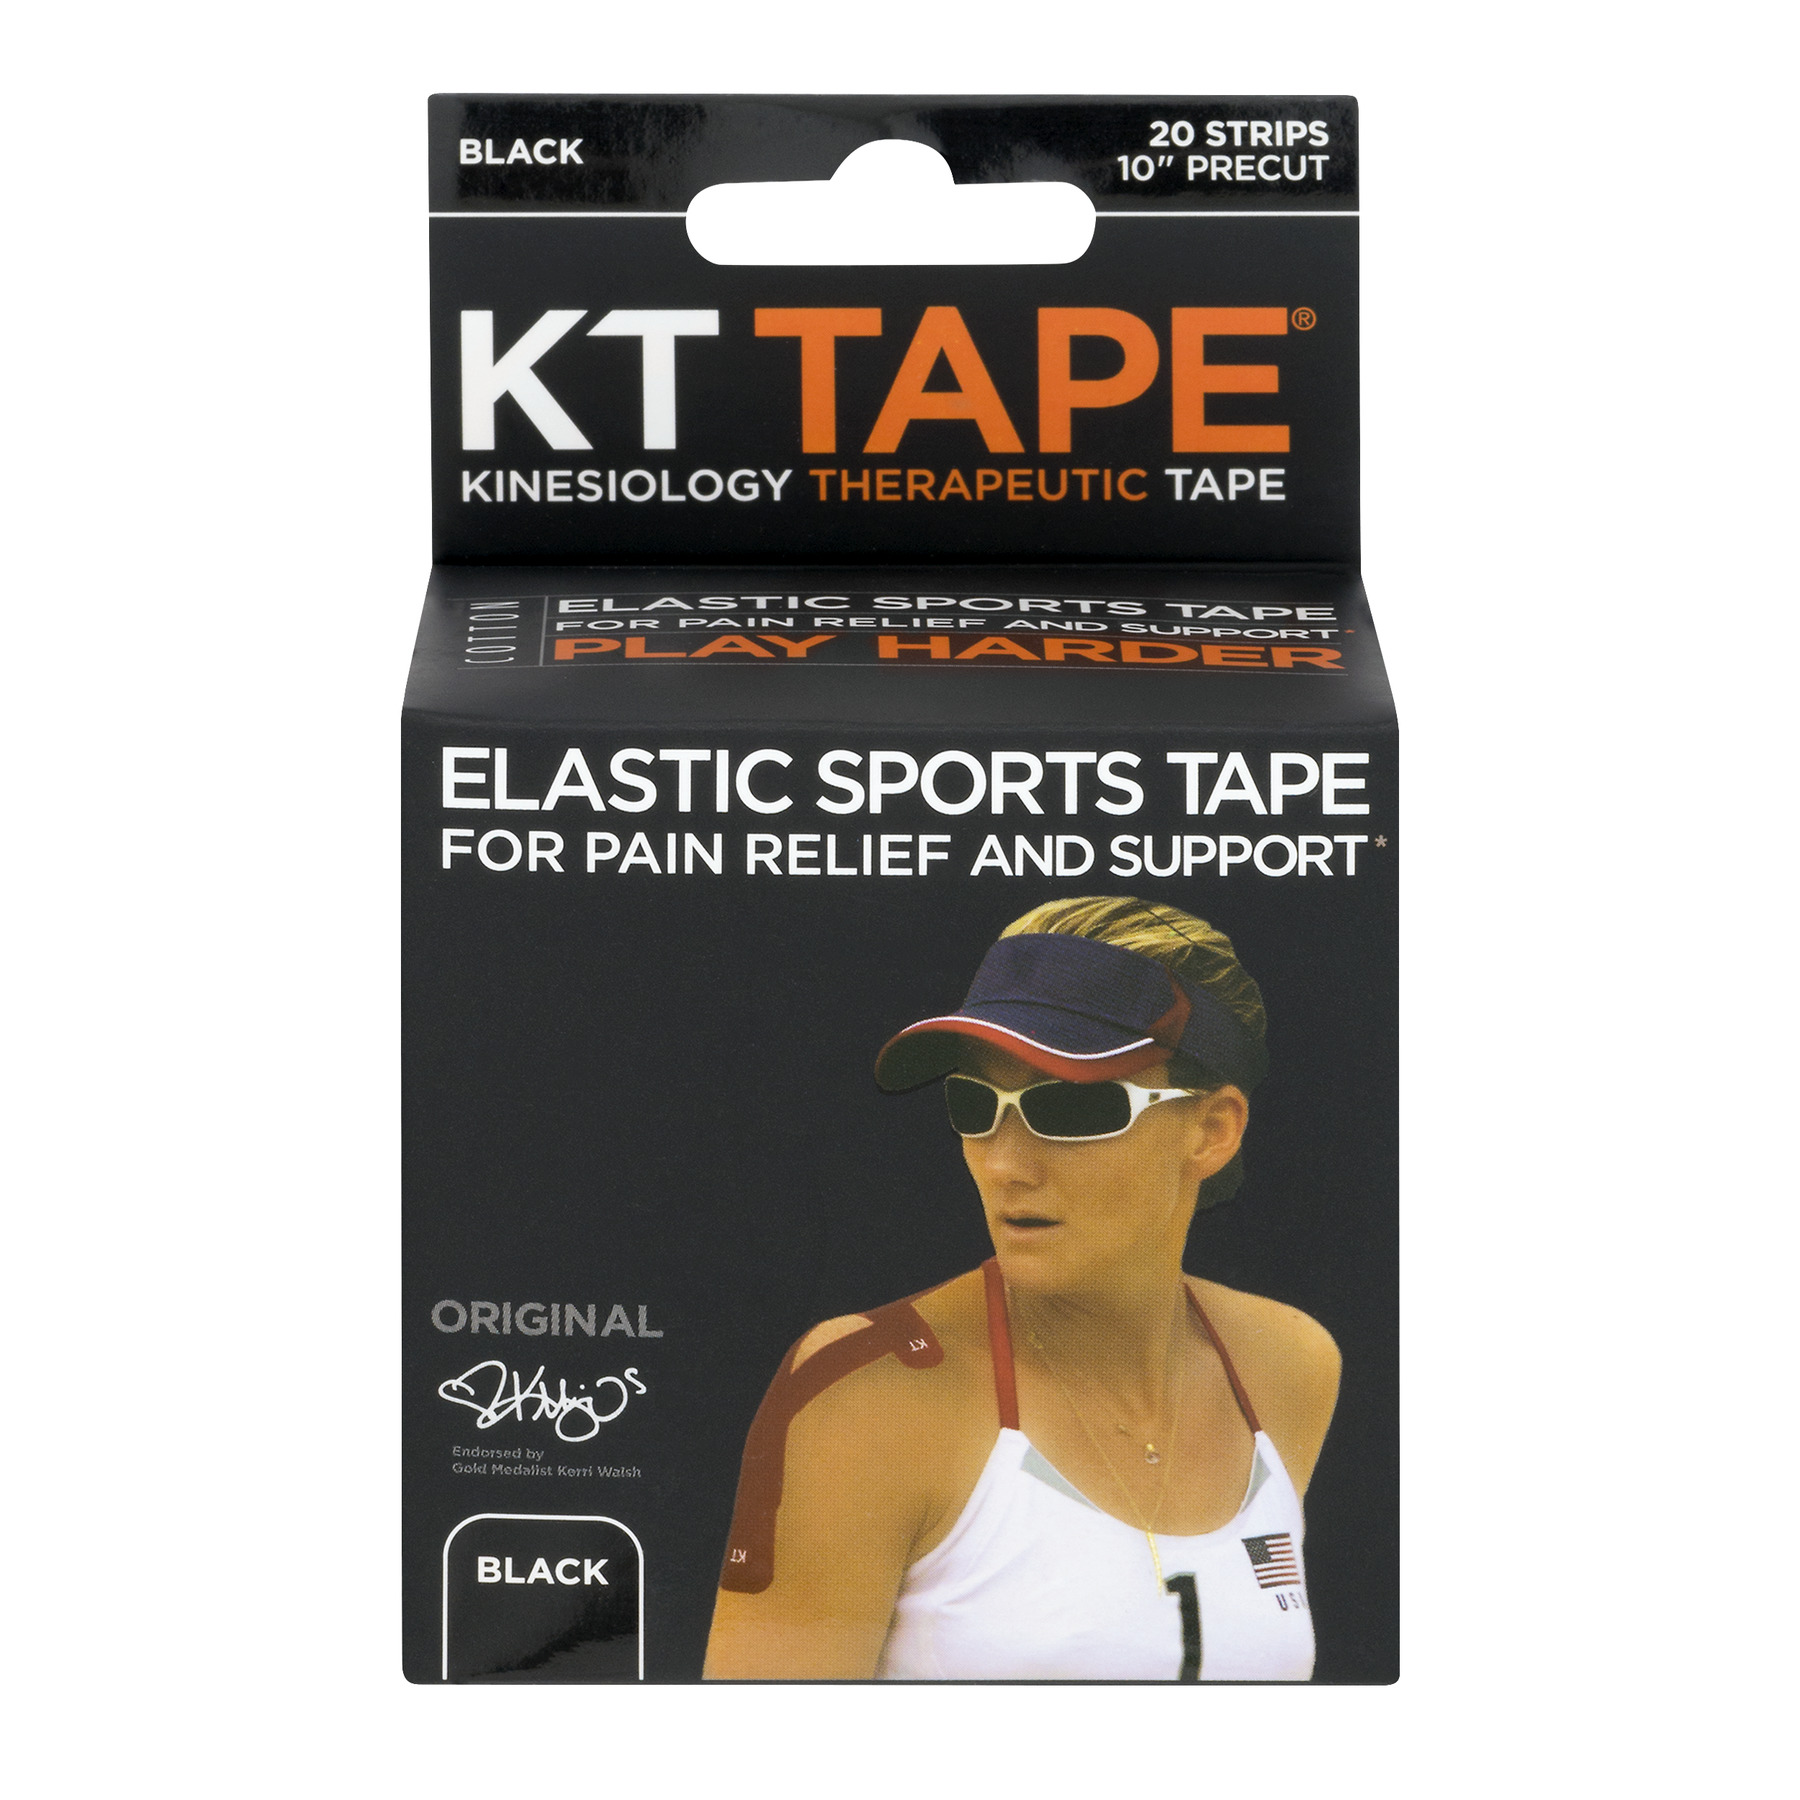 KT Tape Elastic Sports Tape Strips Black - 20 CT20.0 CT